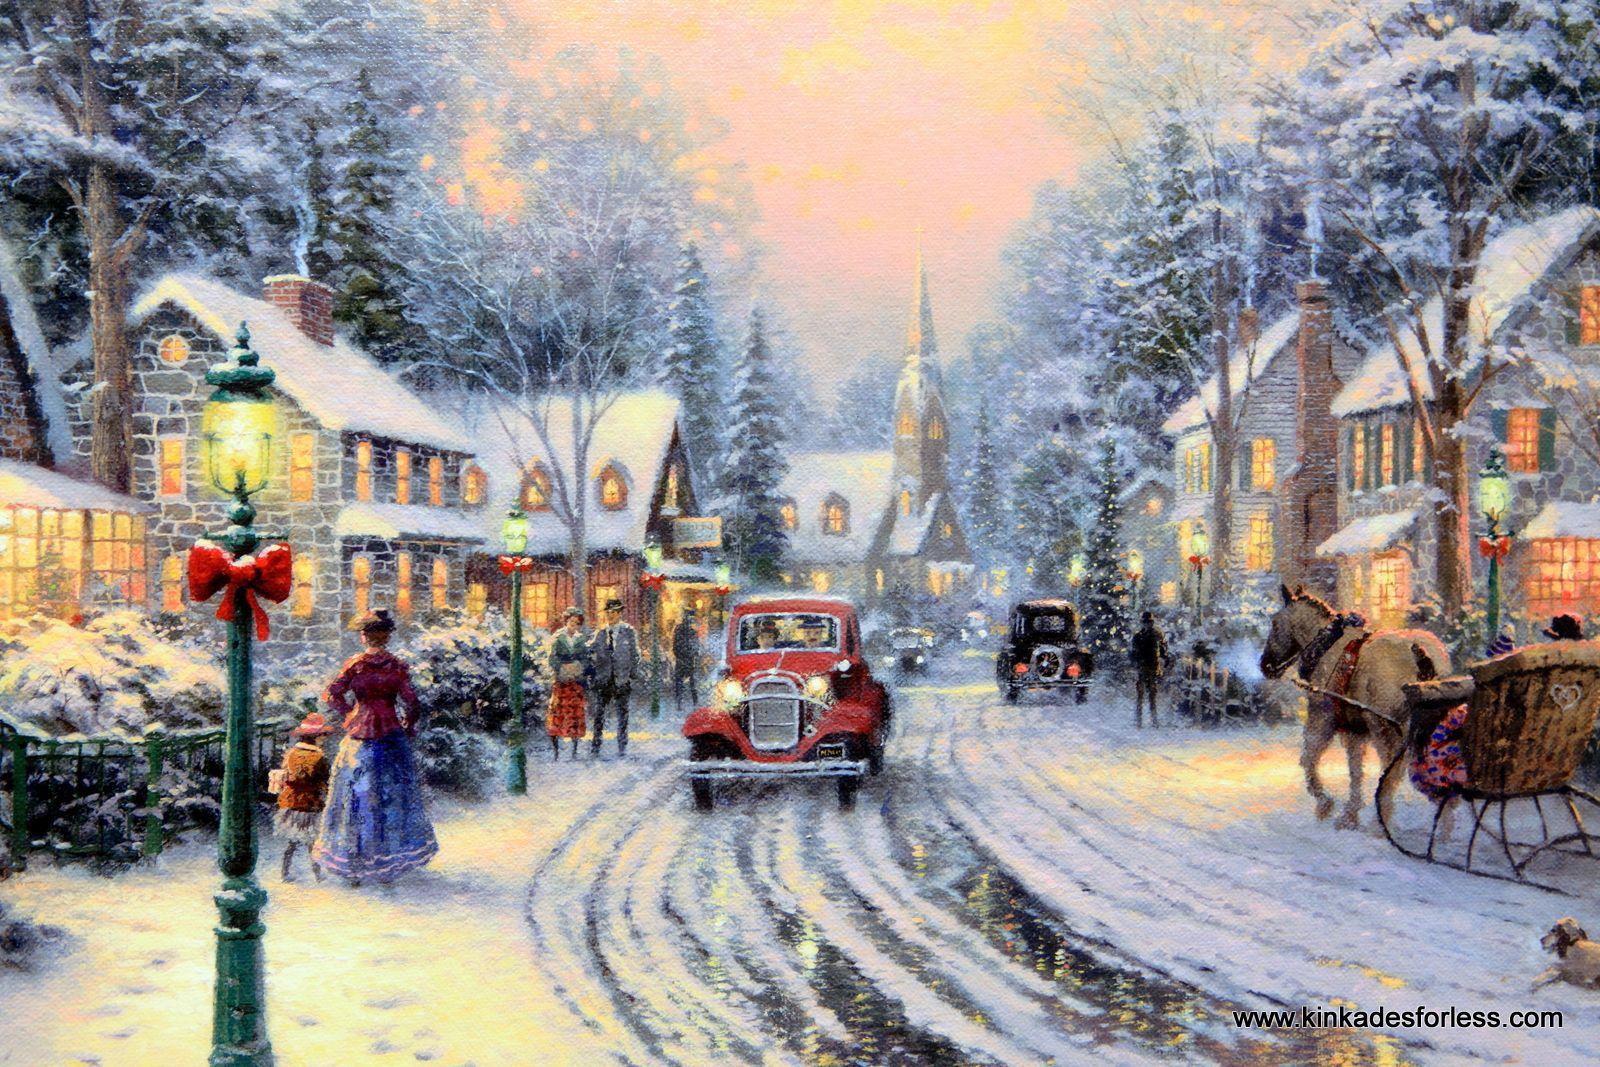 Thomas Kinkade Christmas Village | Village Christmas on canvas ...